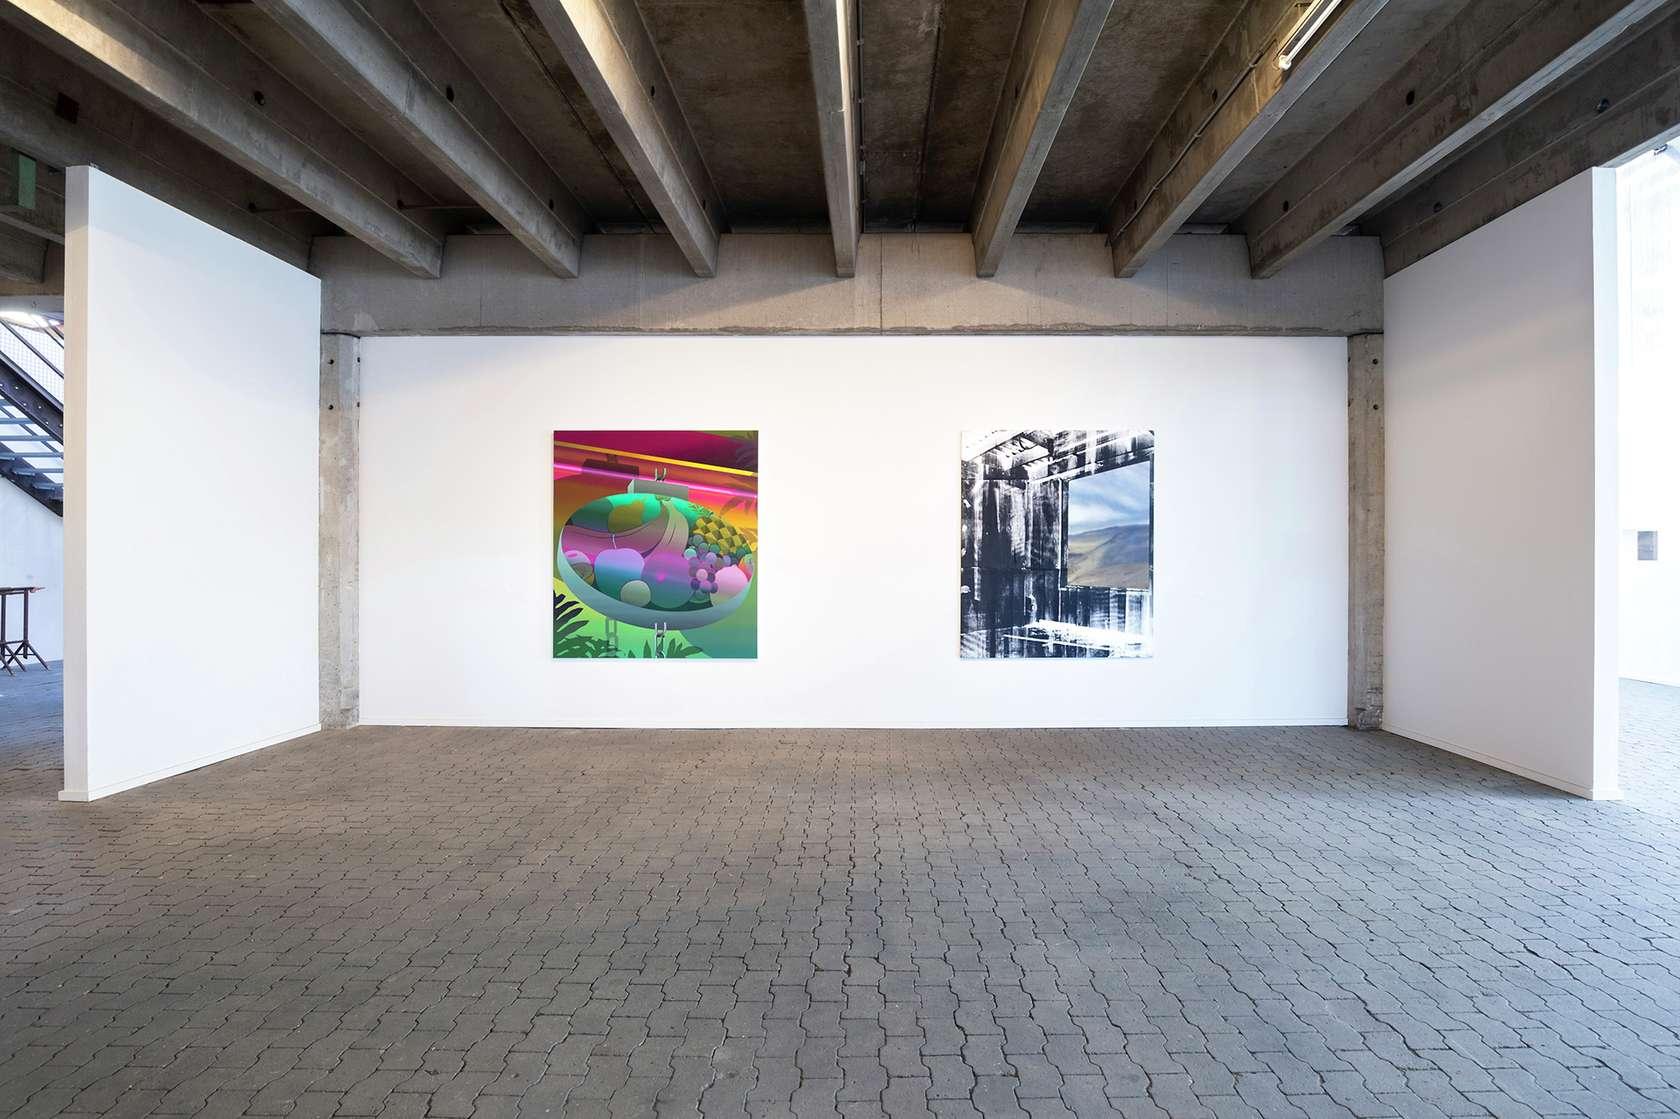 Amélie Bertrand & Hippolyte Hentgen Some of us, an overview on the French Art scene Kunstwerk Carlshütte, Büdelsdorf (DE) 1er juin  — 13 octobre 2019